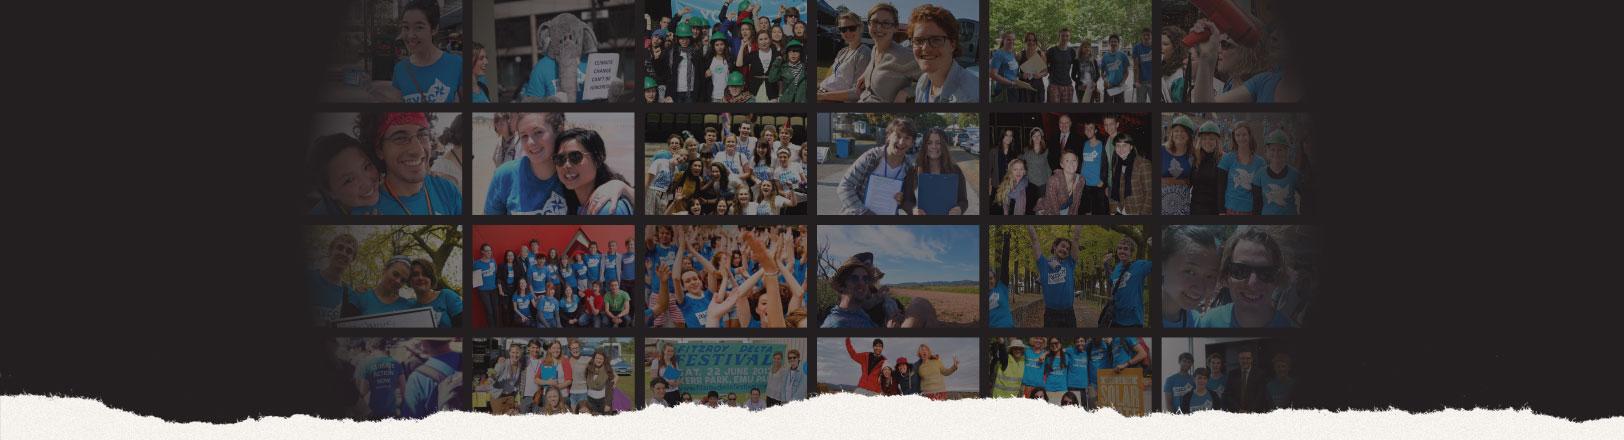 Brisbane Volunteer info night